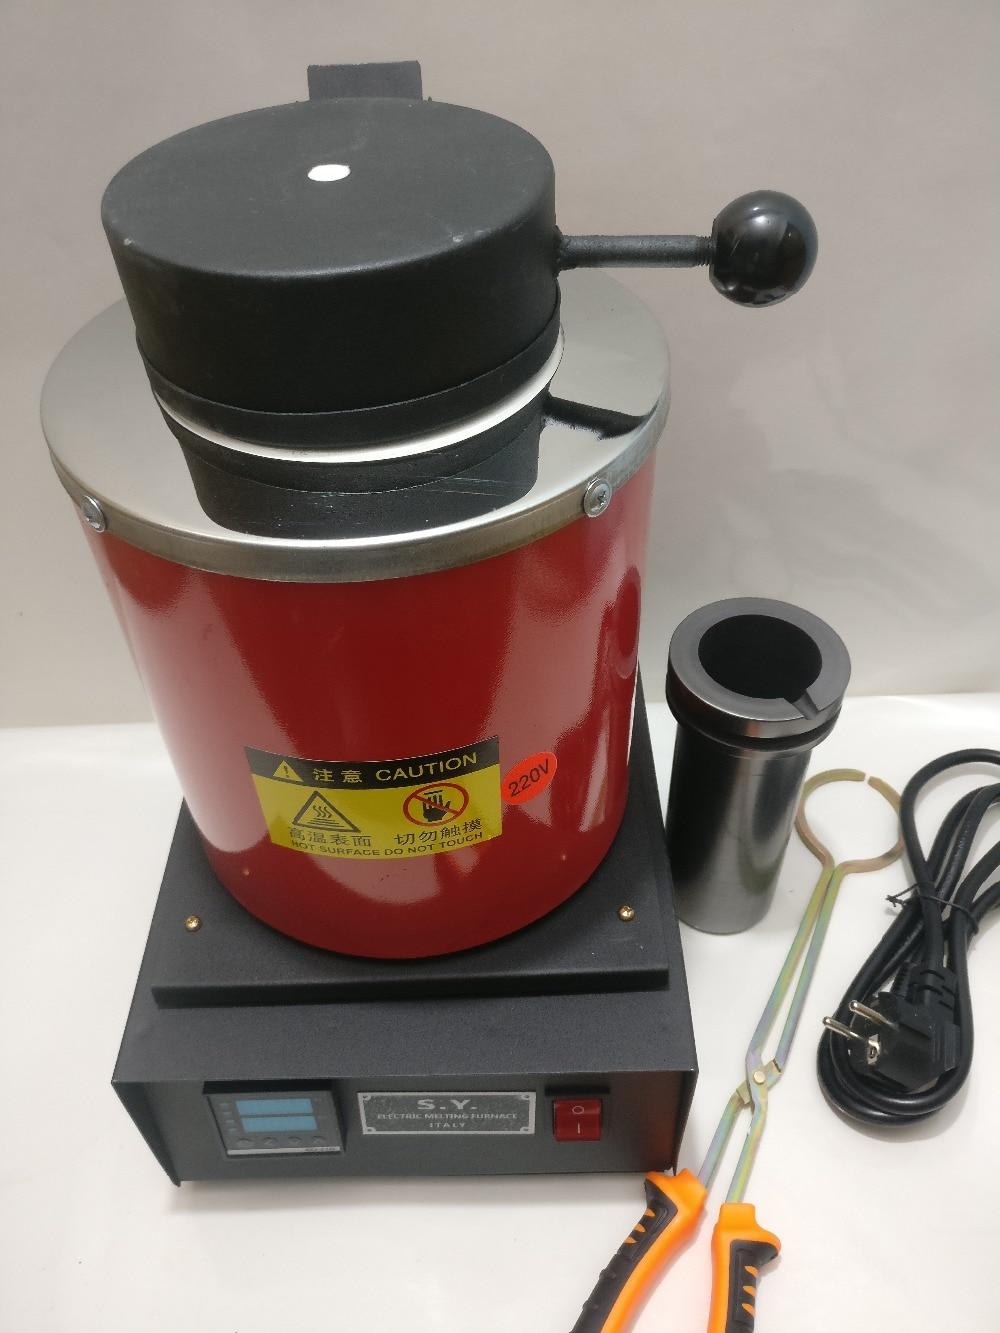 110v/220v, Jewelry Melter, Electric Melting Furnace Gold And Silver Melting Oven With Capacity 2kg,brass Smelting Machine Joyeri